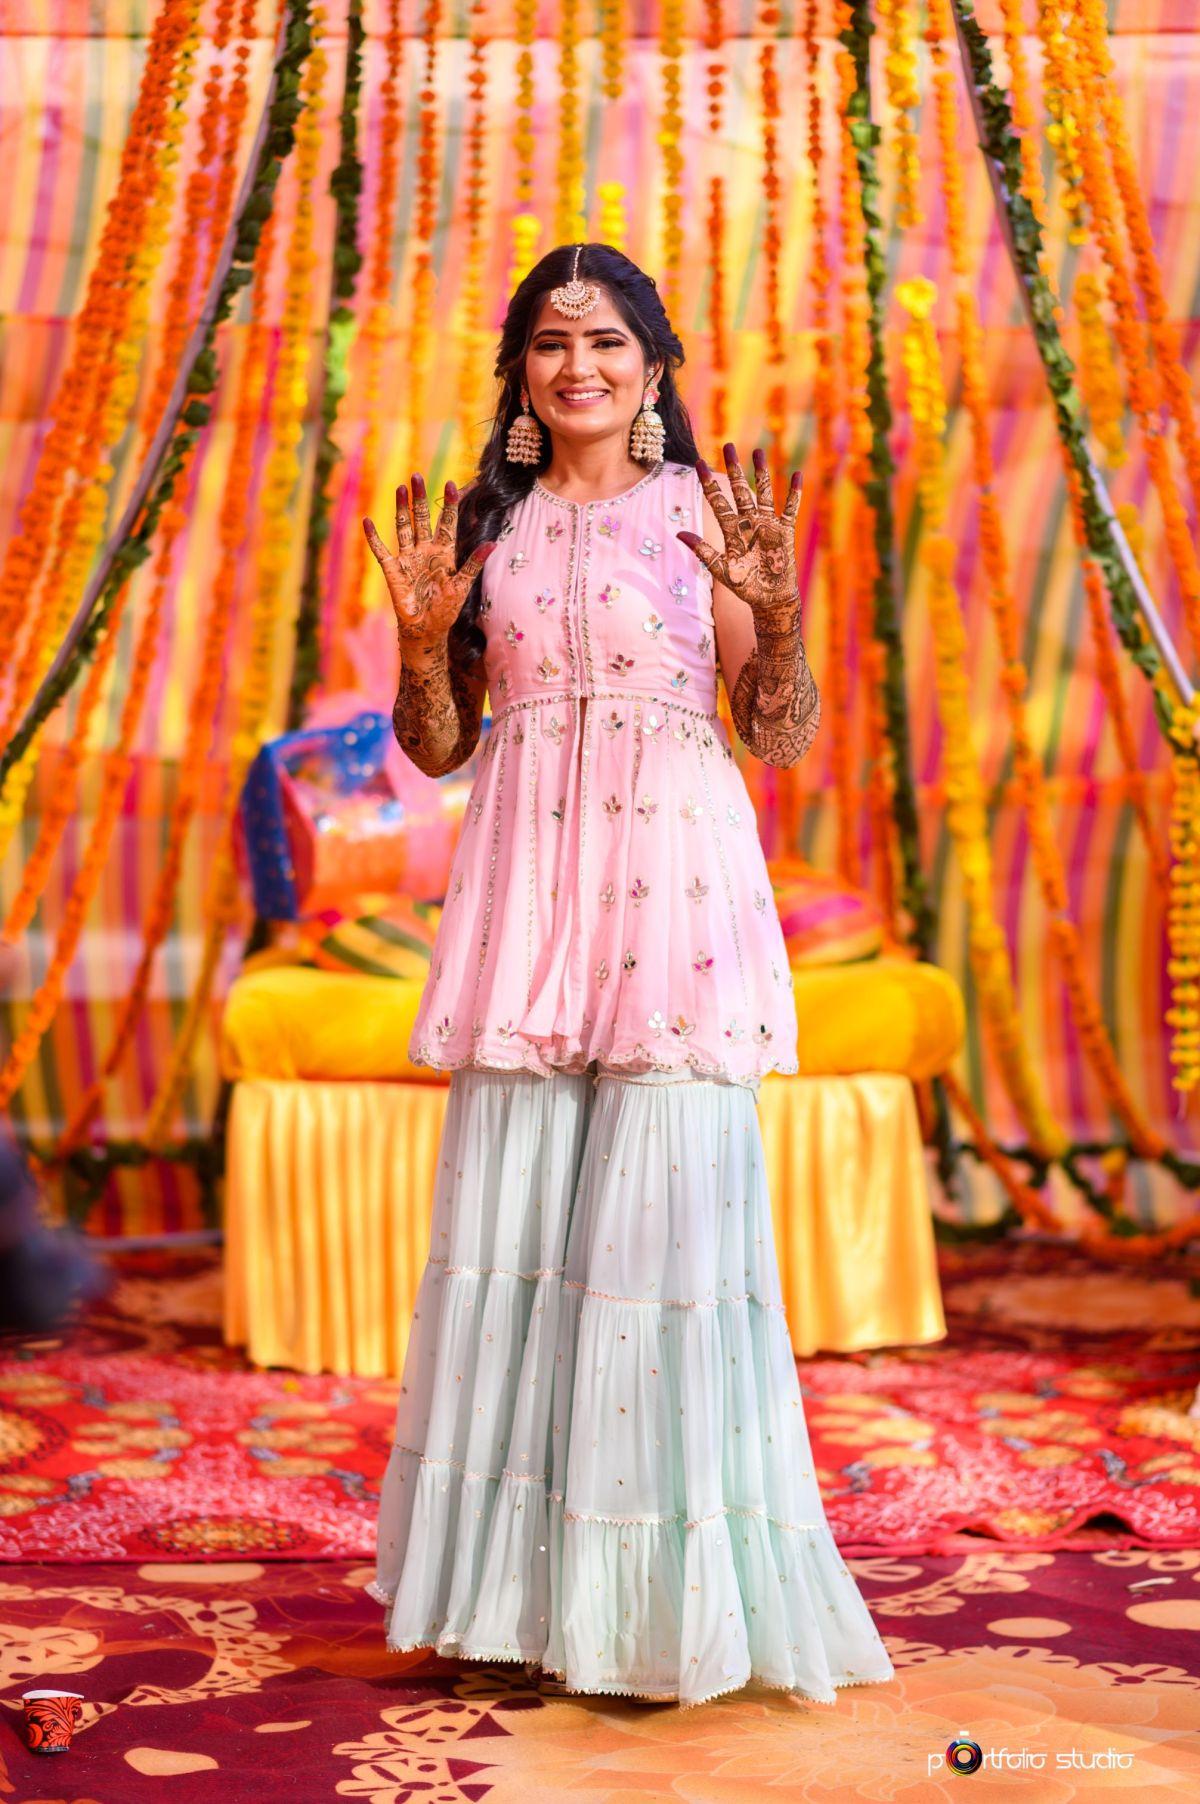 Indian wedding , bridal outfit , wittyvows , lehenga , wedding 2020 , jaipur wedding | covid wedding